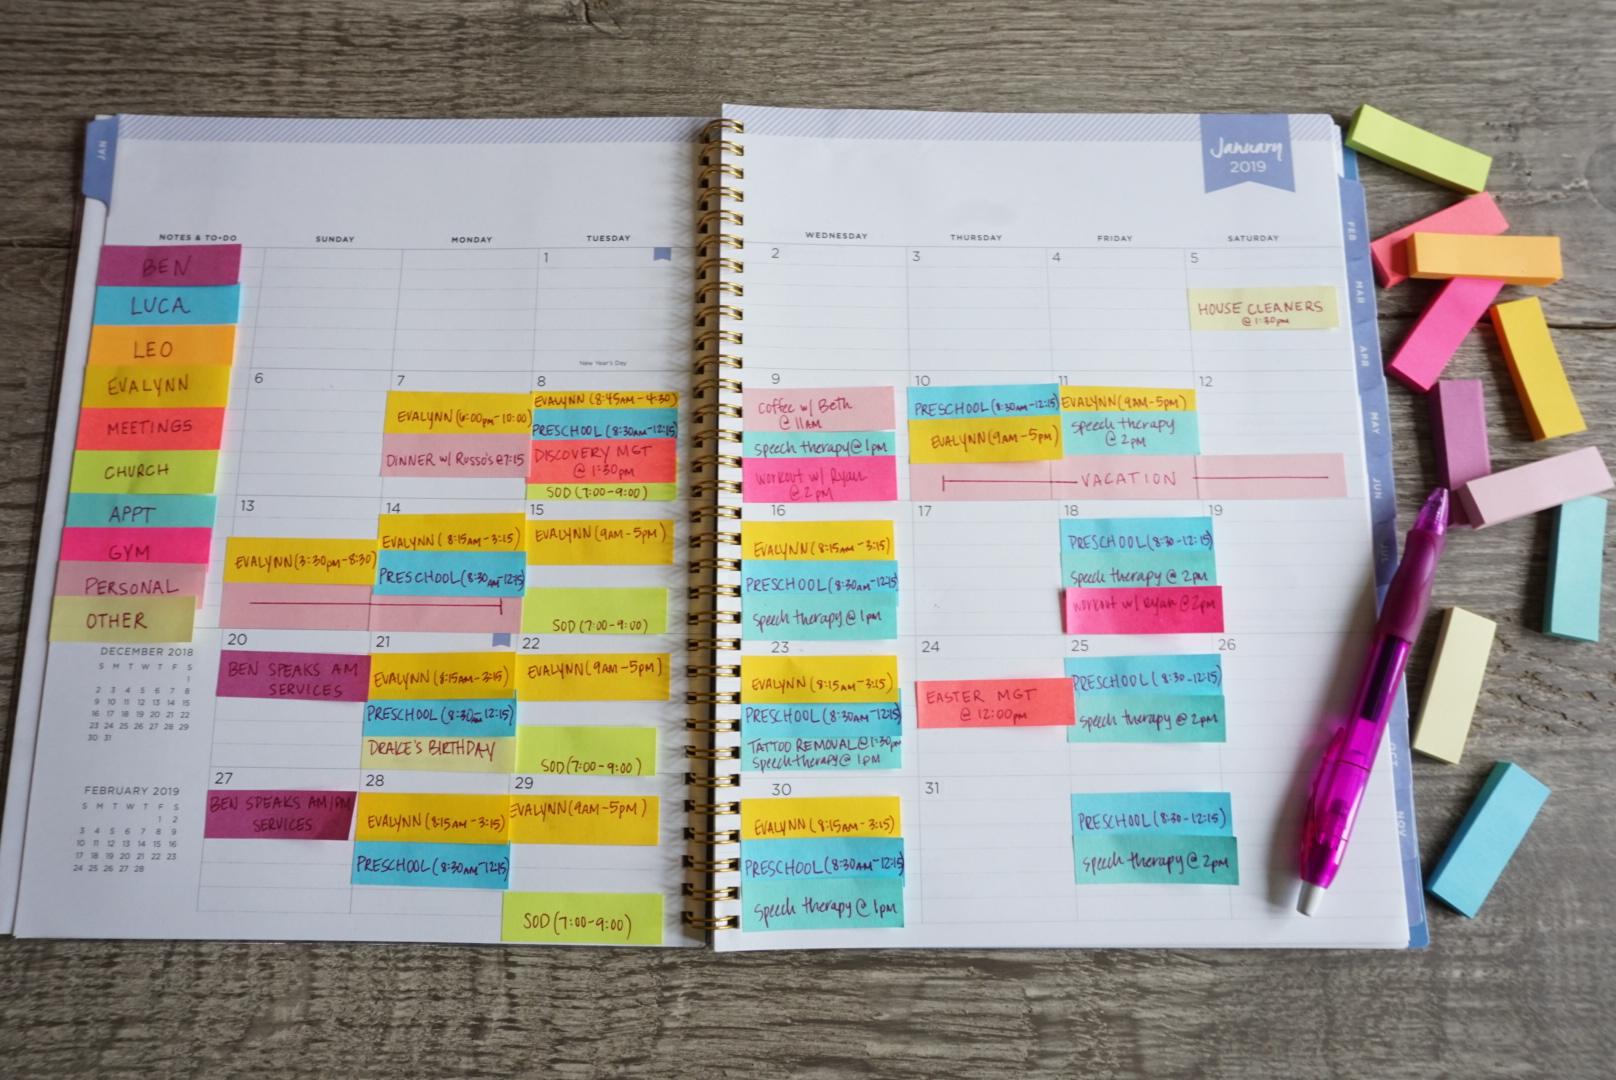 How I Organize My Calendar -